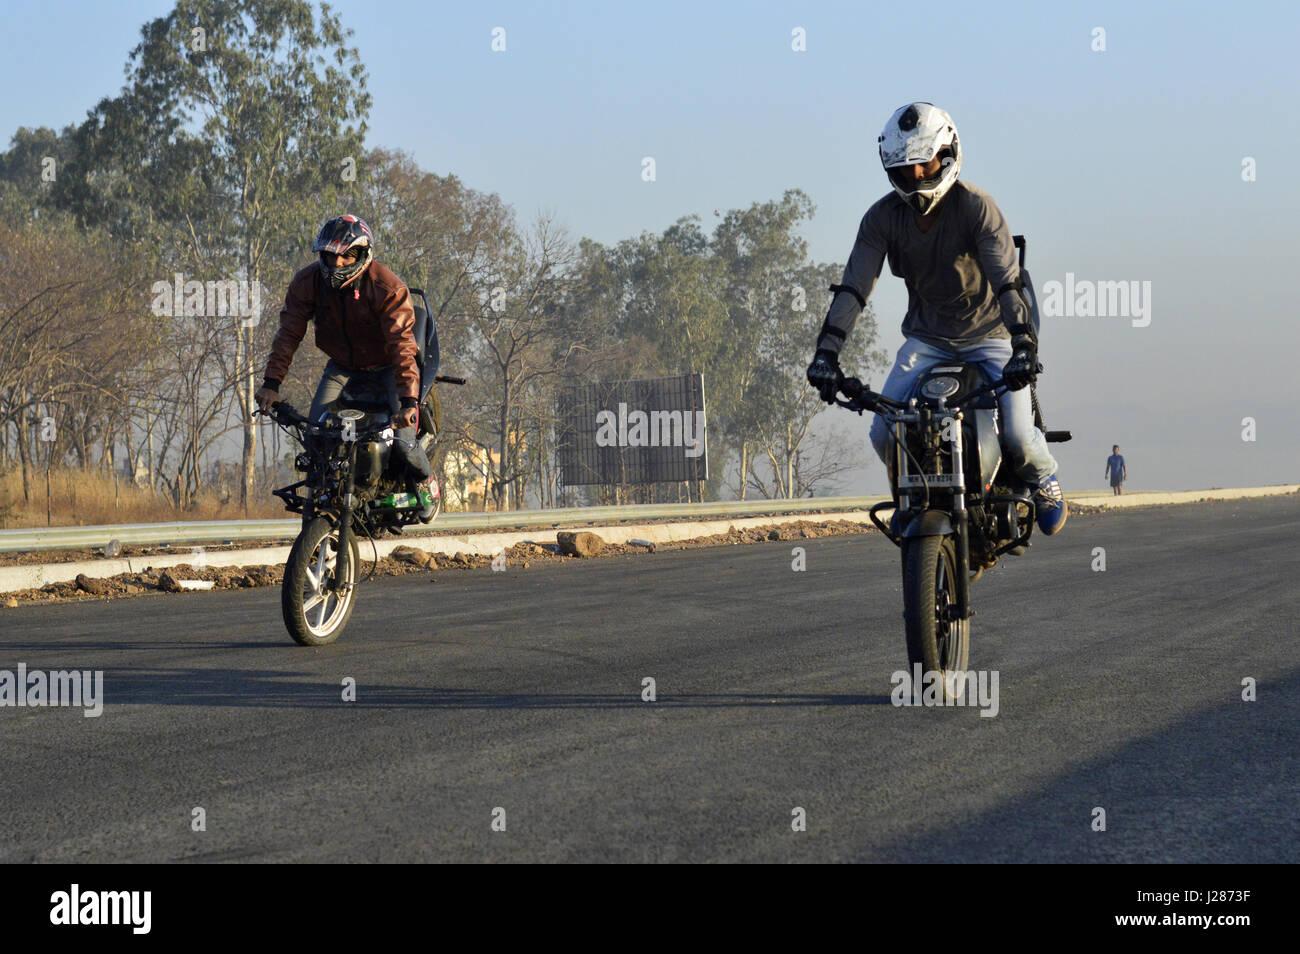 Two stunt motorcycle riders making stoppie near Pune, Maharashtra - Stock Image